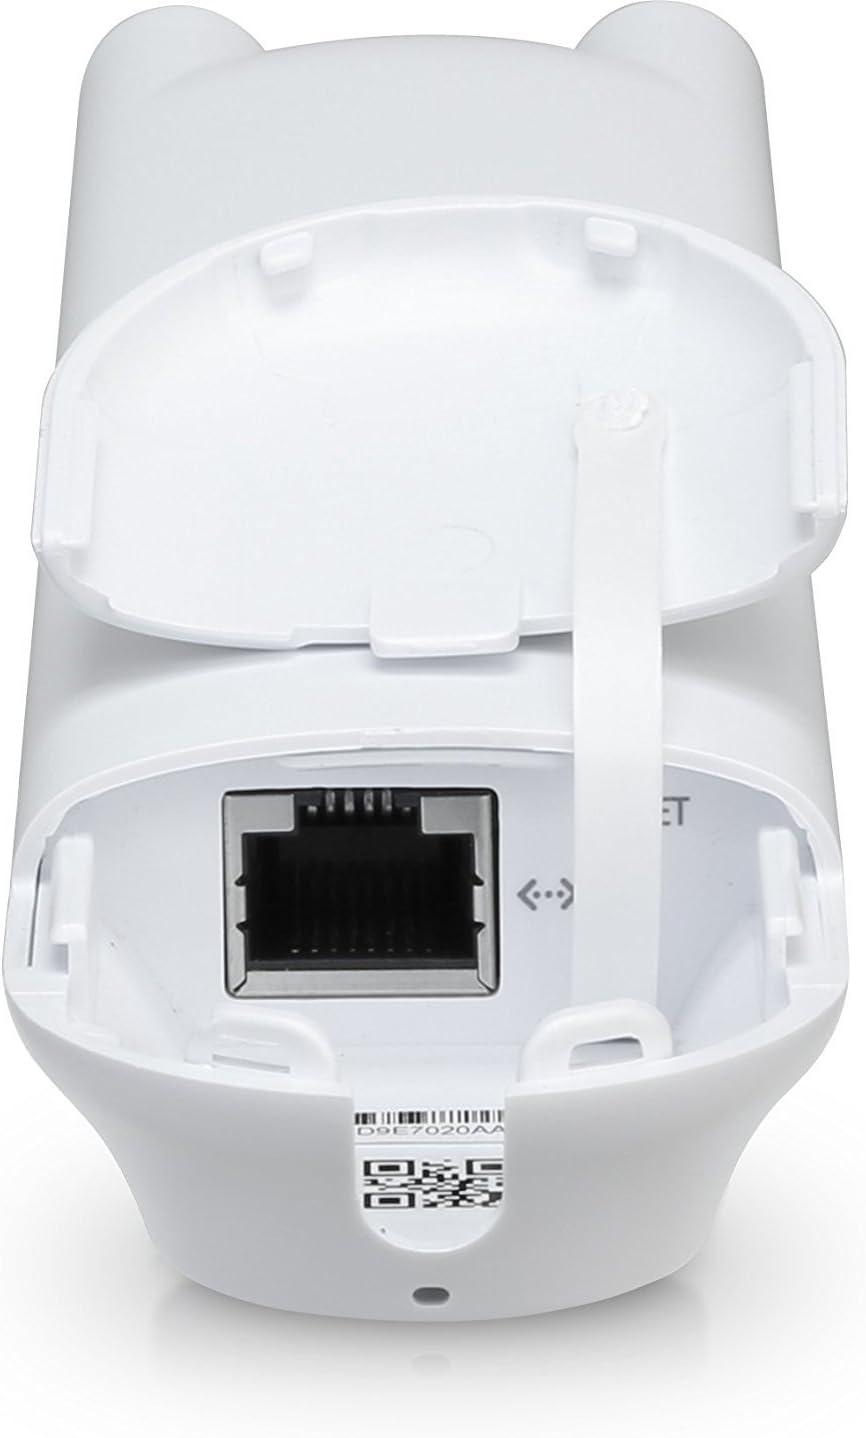 Ubiquiti - Punto de acceso (1167 Mbit/s, IEEE 802.3af, Blanco, Pared, 46 mm, 34 mm)